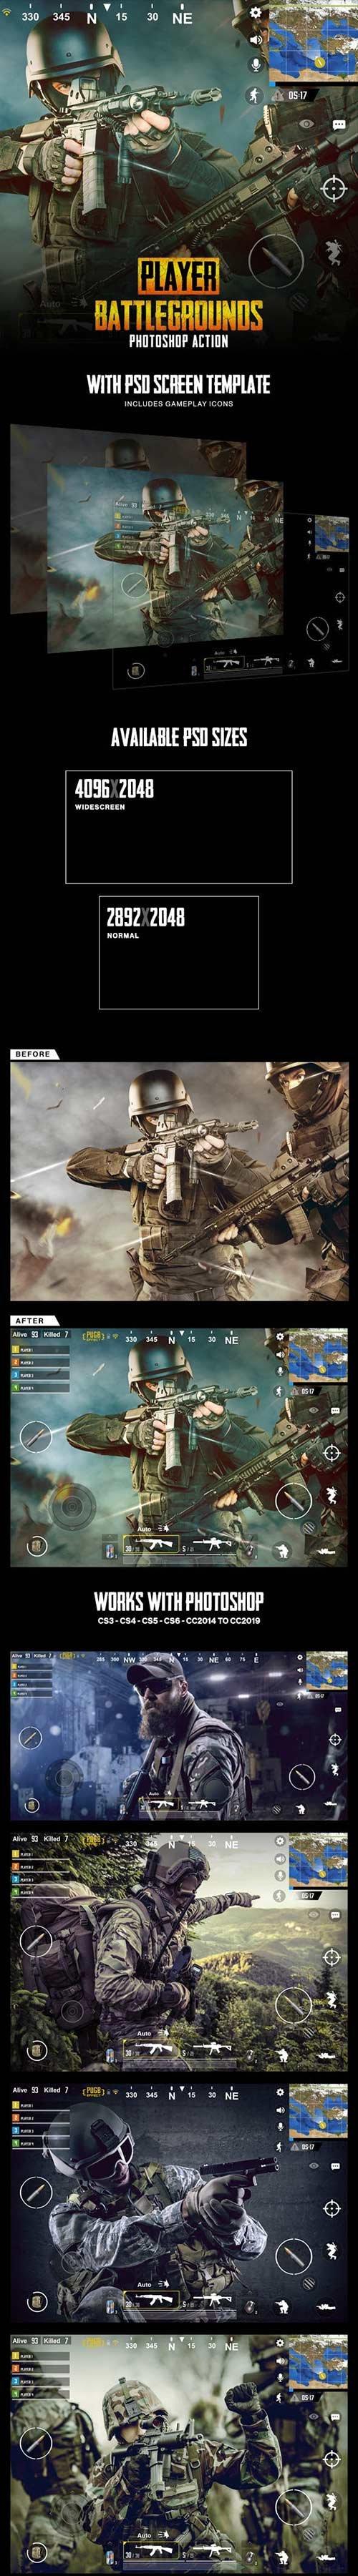 Graphicriver - Player Battlegrounds Photoshop Action 23123275